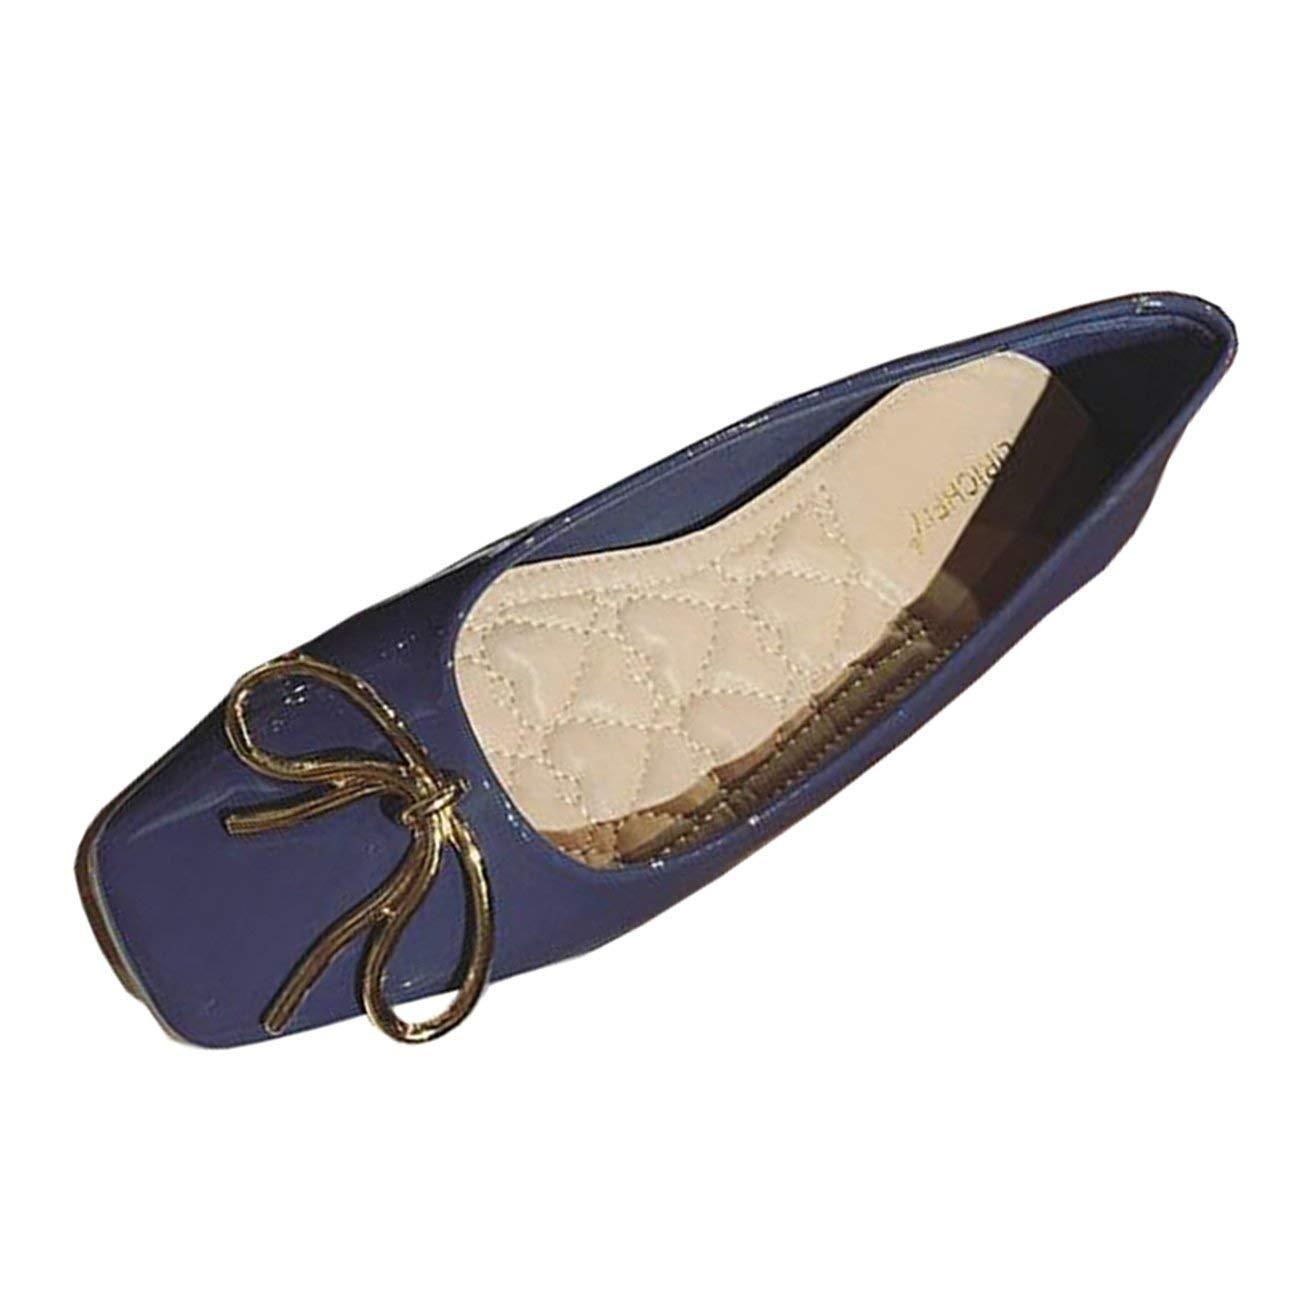 Fuxitoggo Frauen Square-Toe Wohnung Slip-on Bowknot Ballerinas (Farbe   Blau Größe   5 UK)